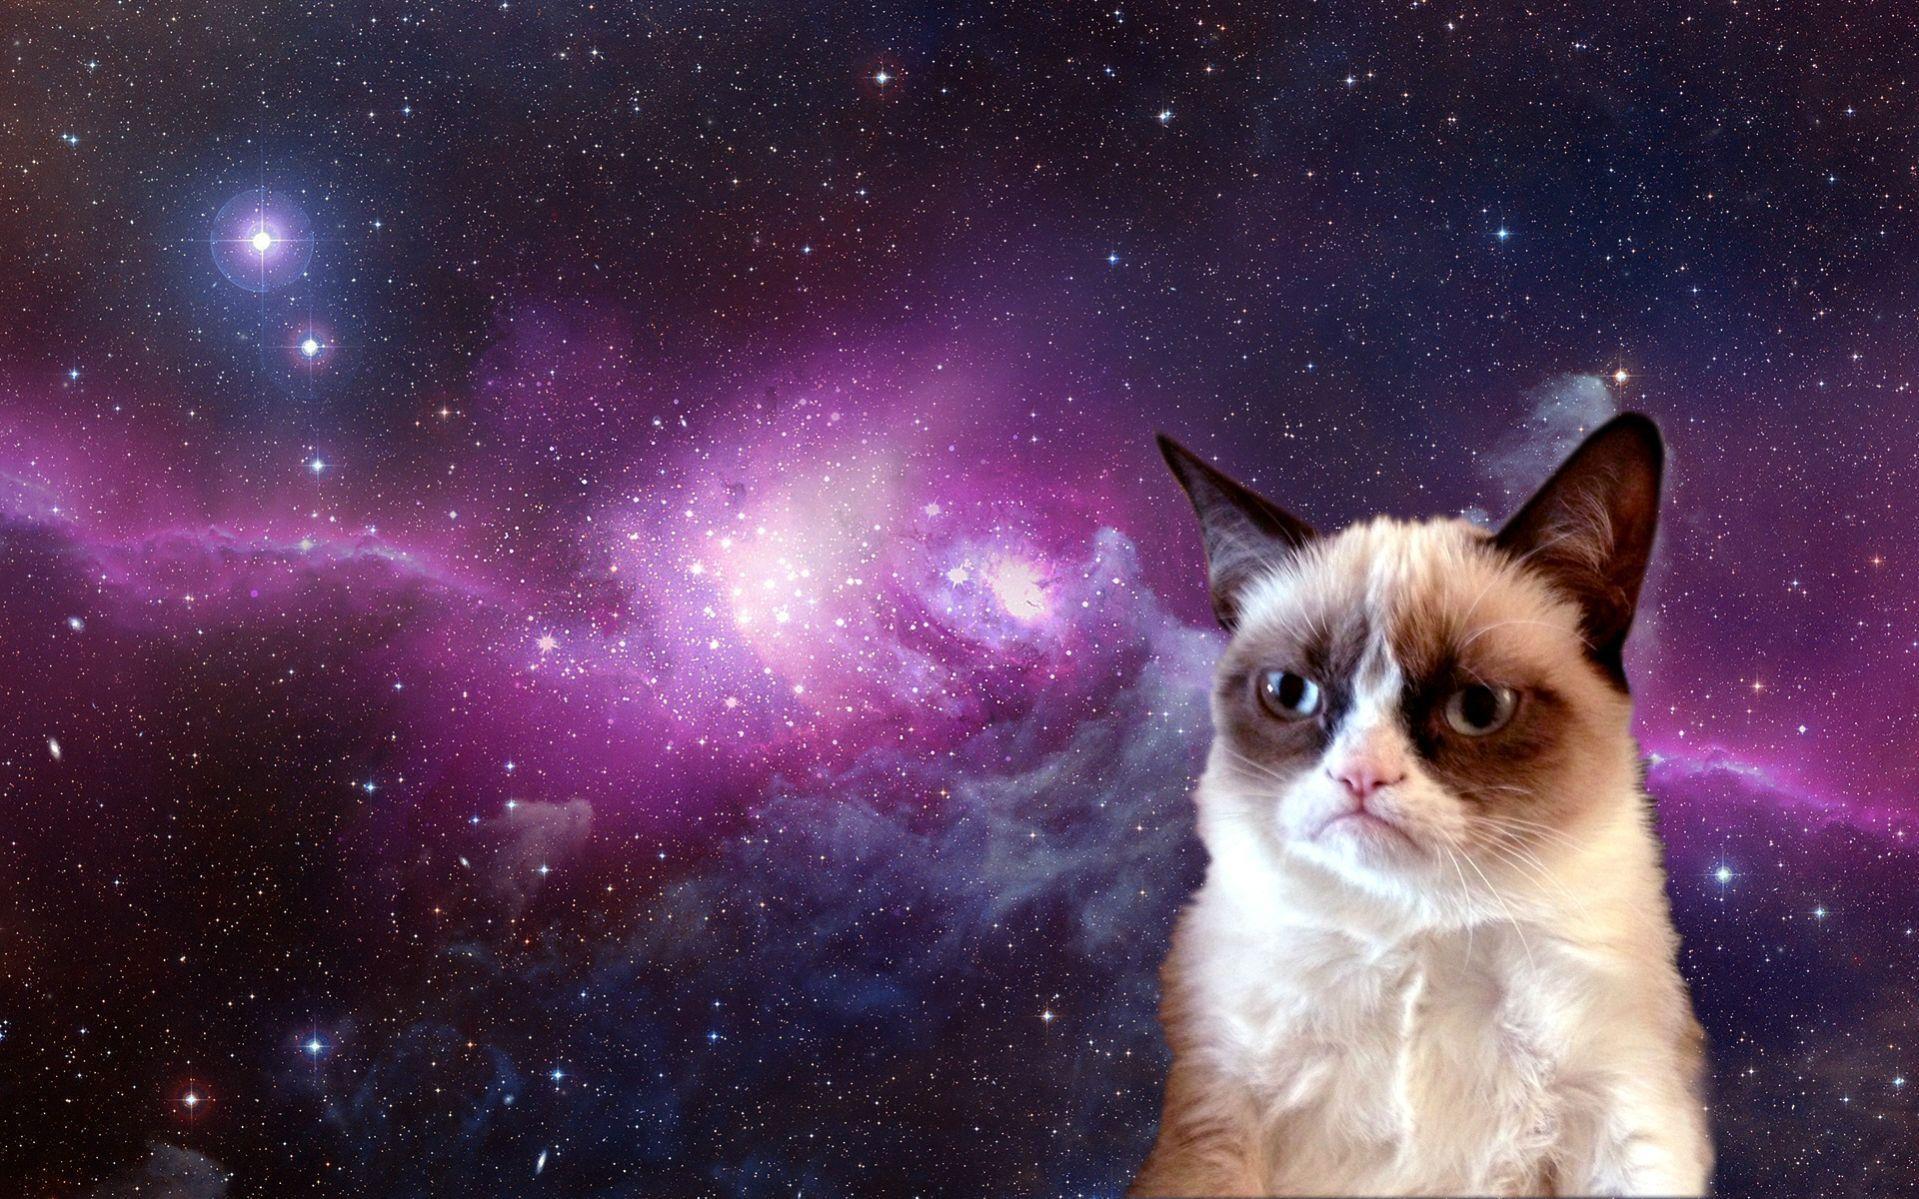 Galaxy Cat Desktop Wallpapers Top Free Galaxy Cat Desktop Backgrounds Wallpaperaccess